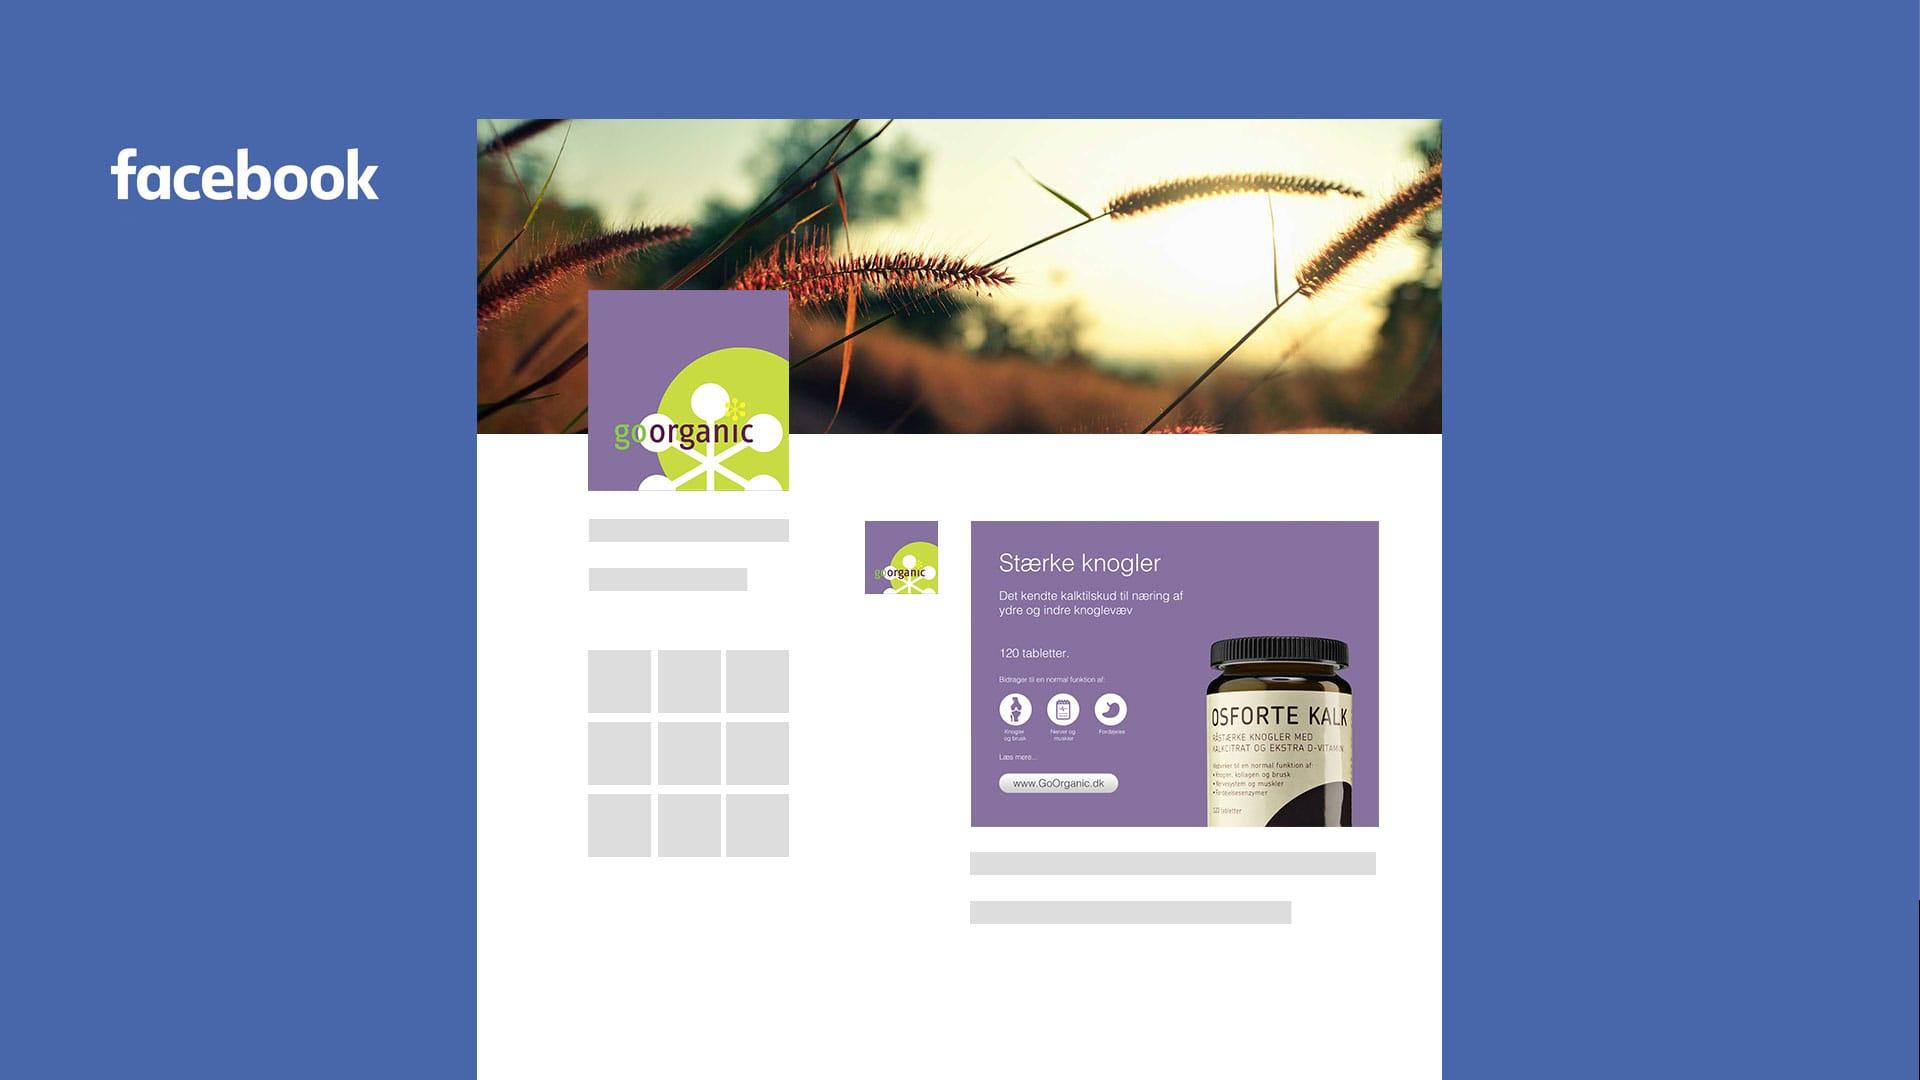 GoOrganic-Social-Media-Image-Sizes-Facebook-04